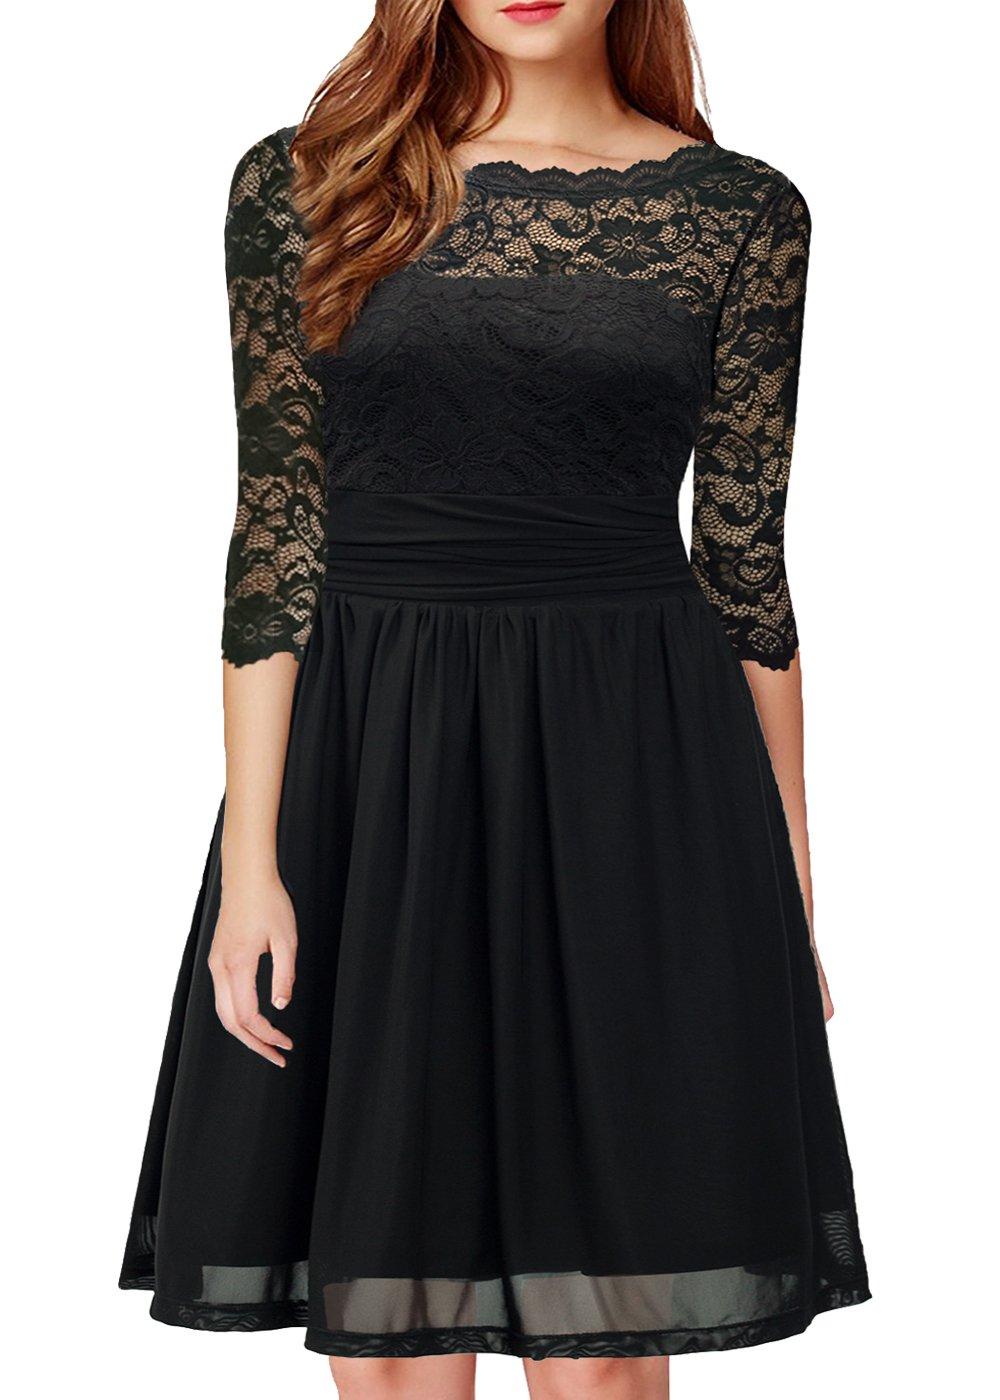 DILANNI Women Plus Size Semi Formal Lace Knee Length Cocktail Party Dress